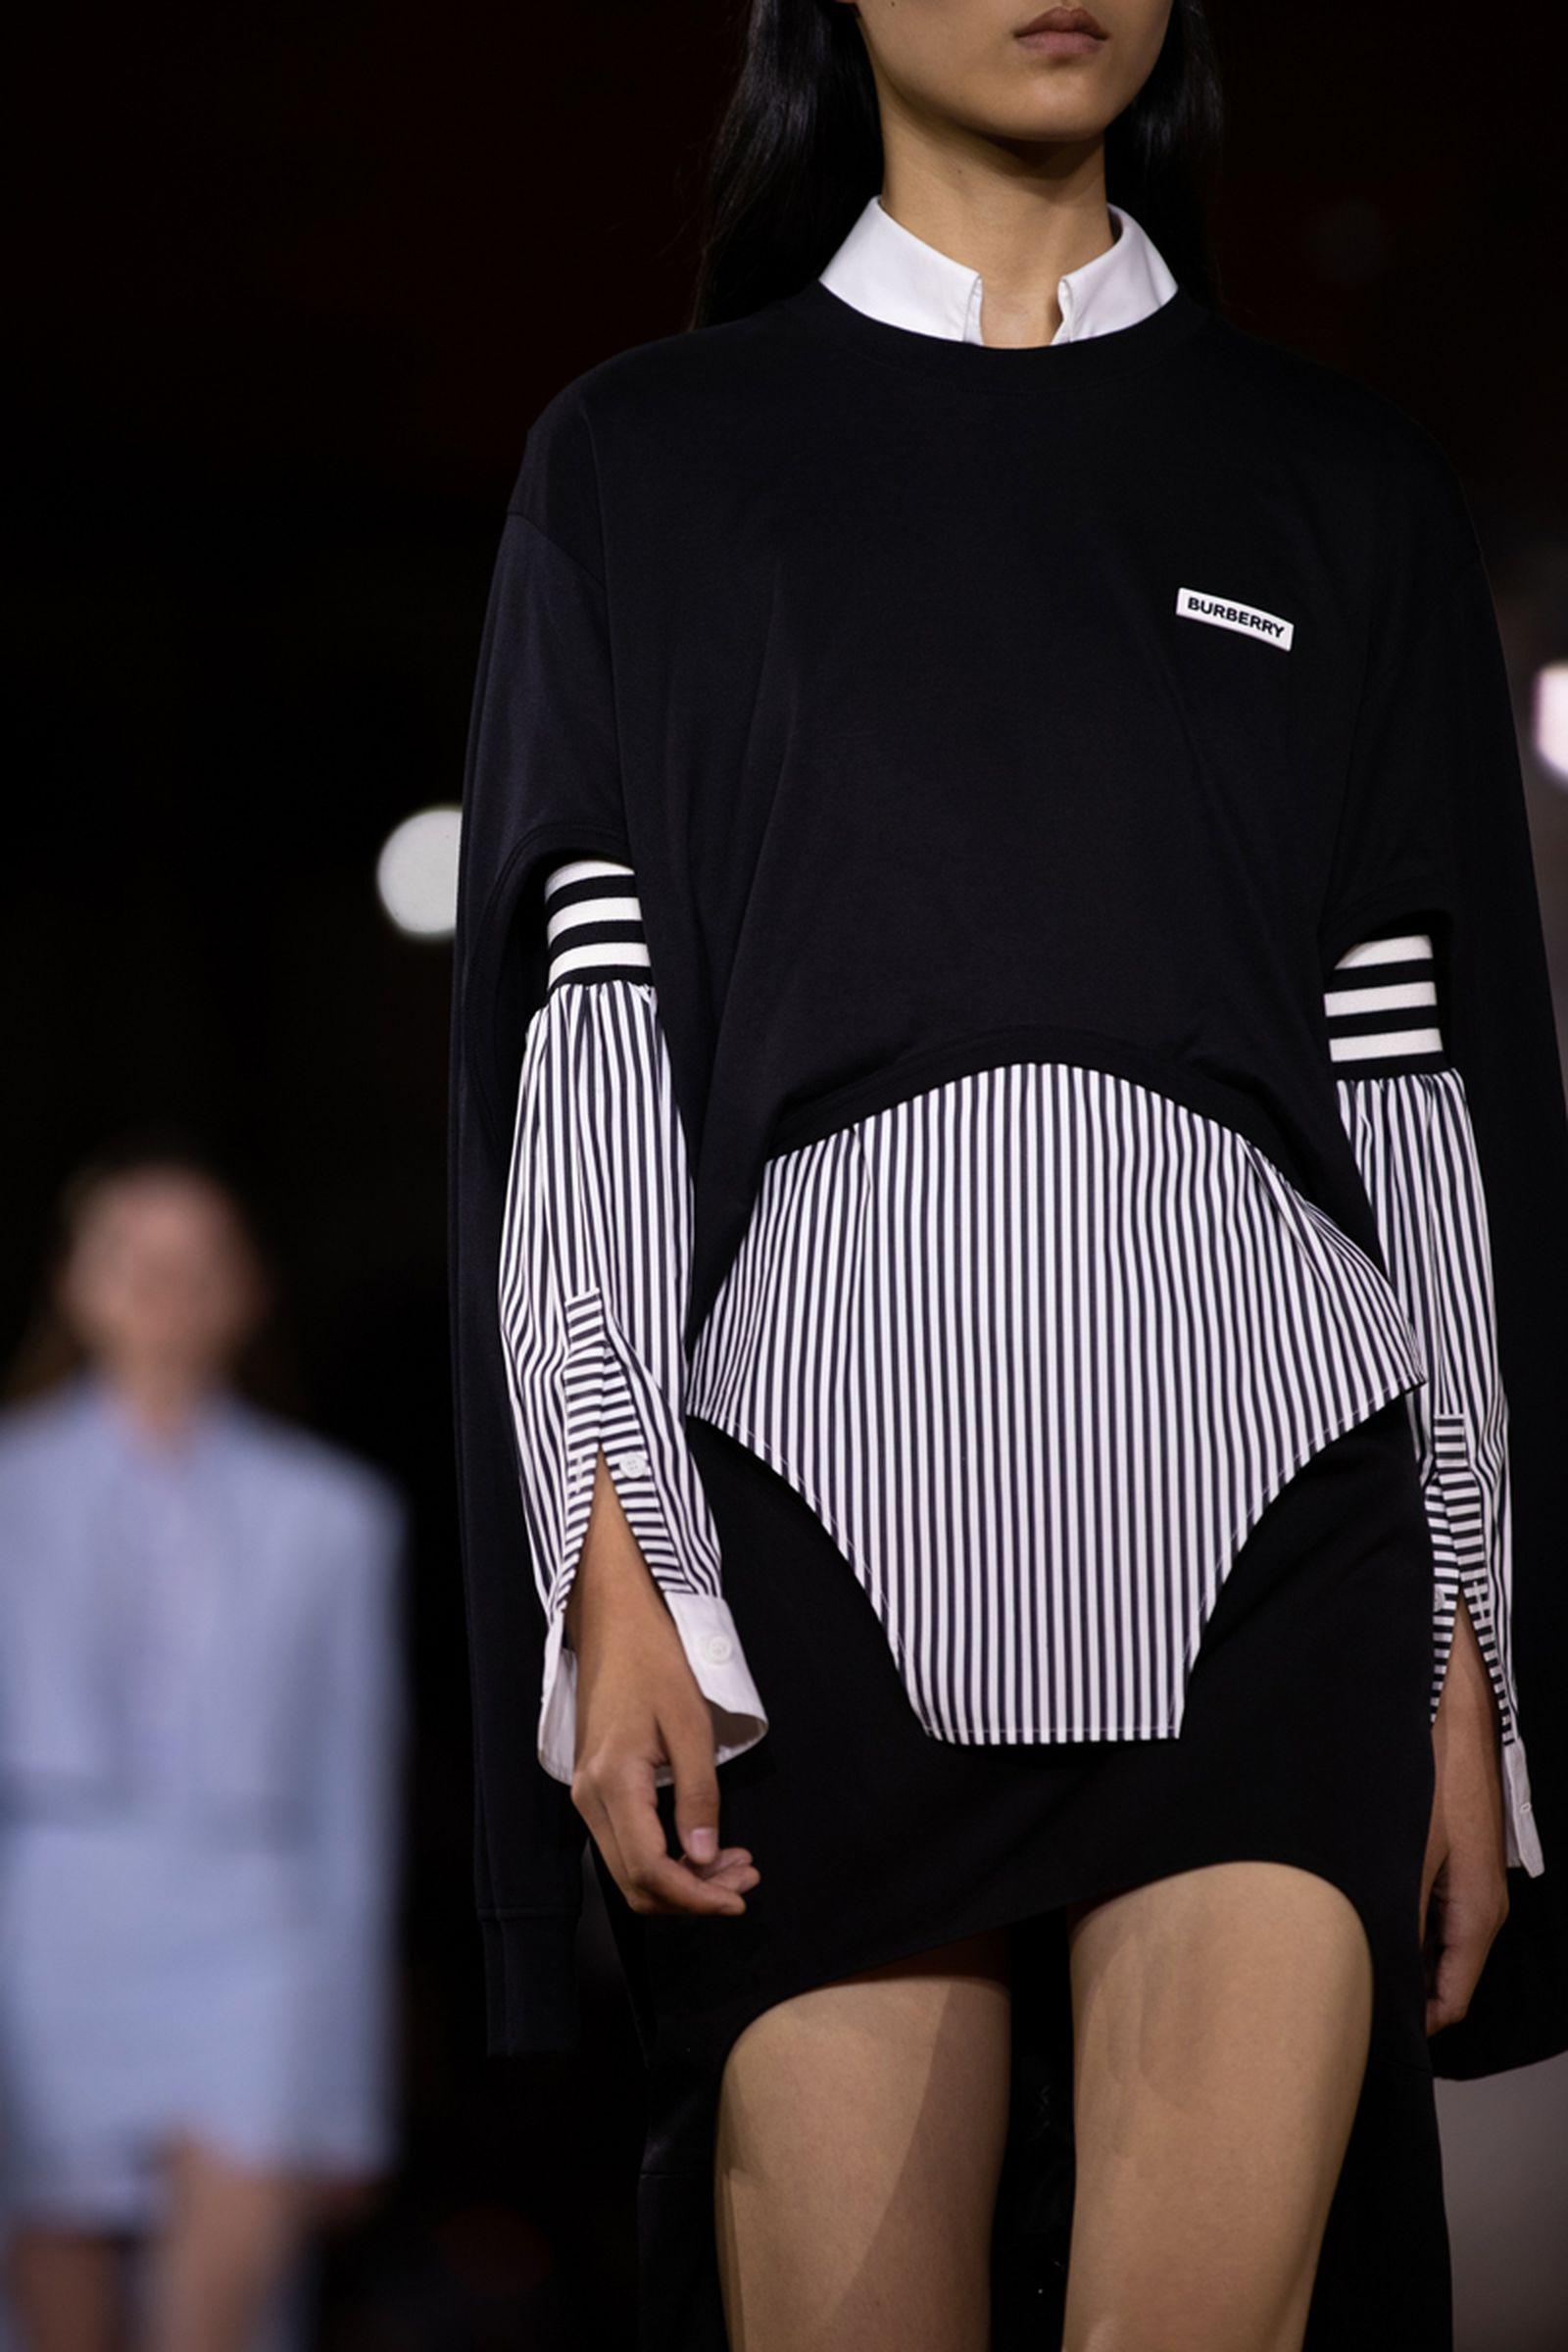 burberry LFW london fashion week riccardo tisci